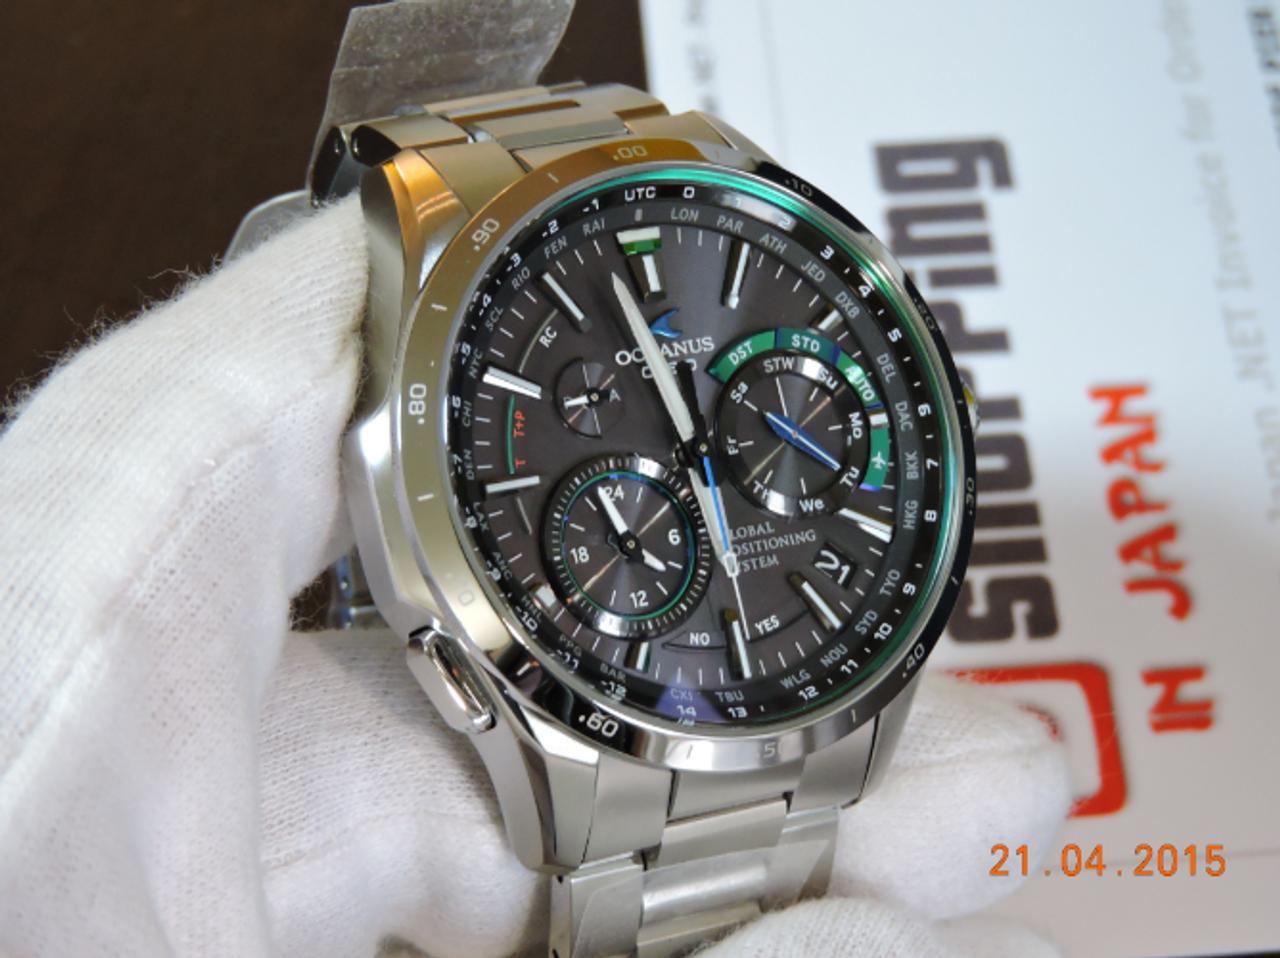 Oceanus OCW-G1000-1A2JF